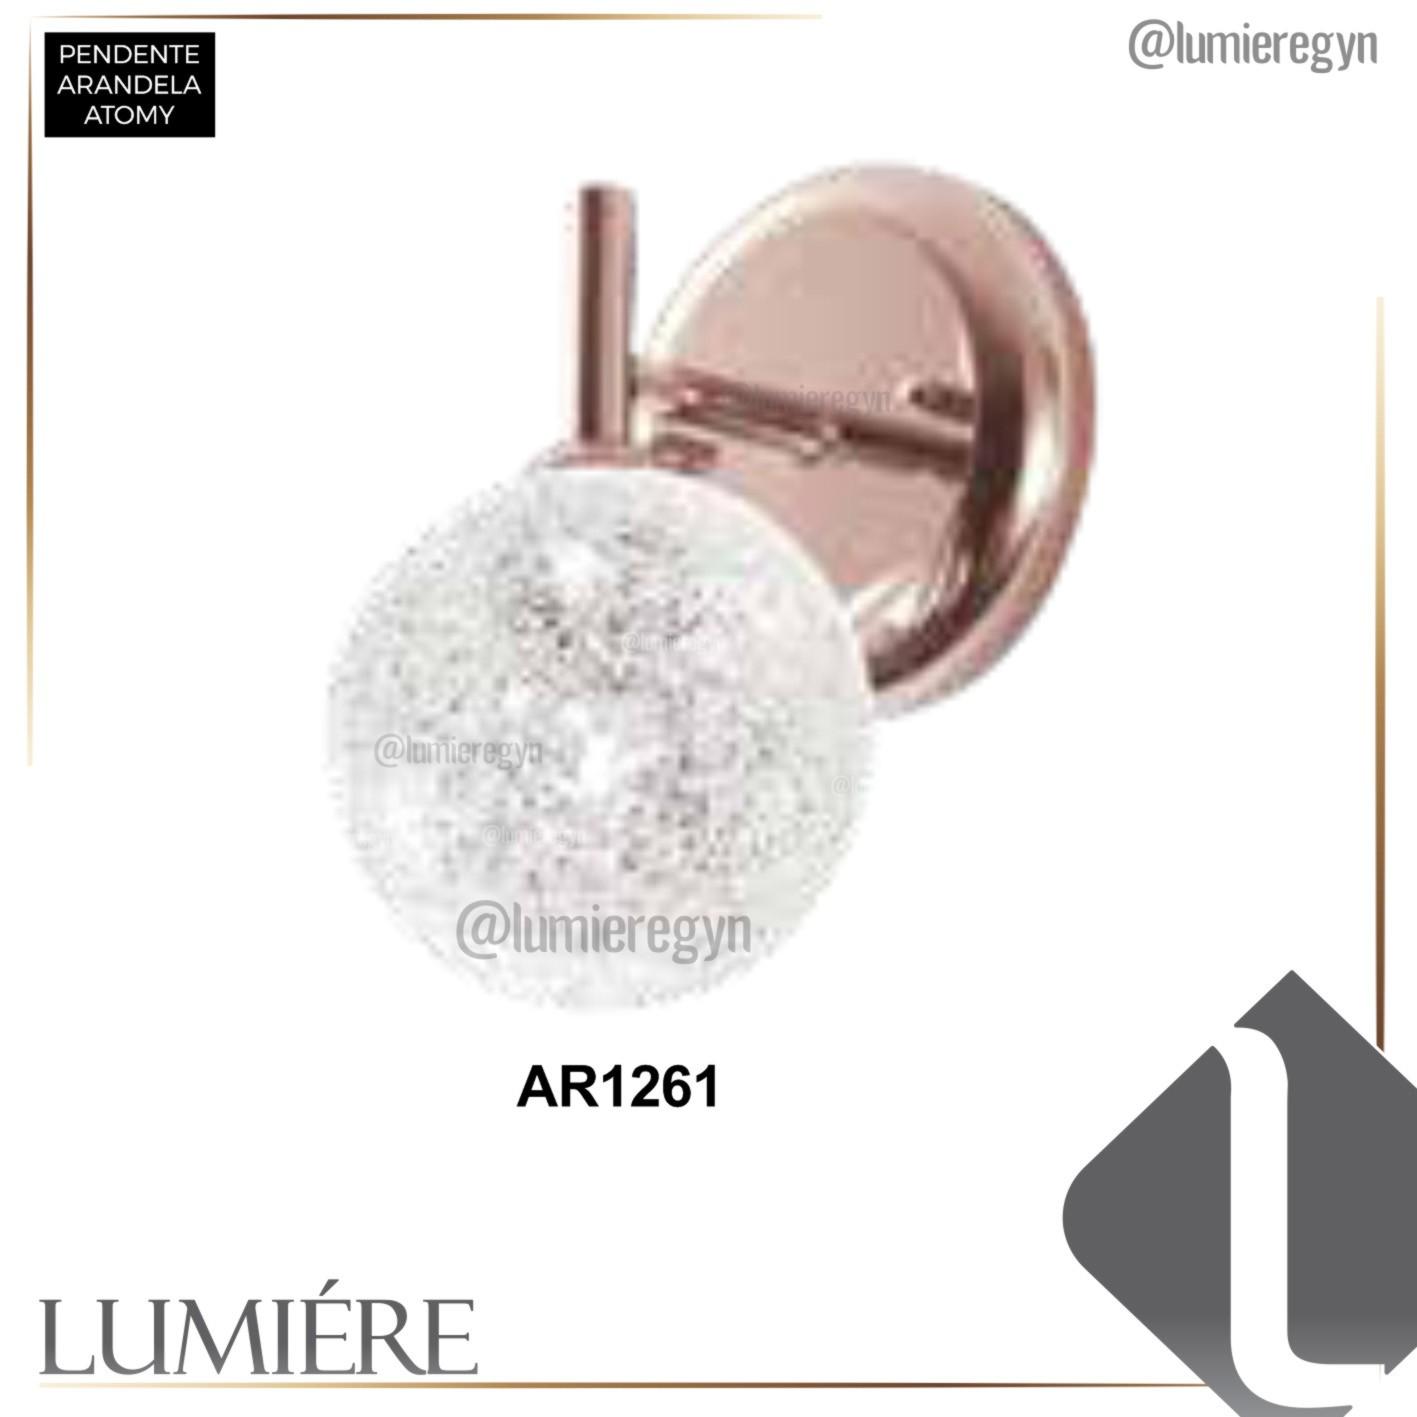 Arandela Quality AR1261 Atomy 1L G9 120x180mm Dourado